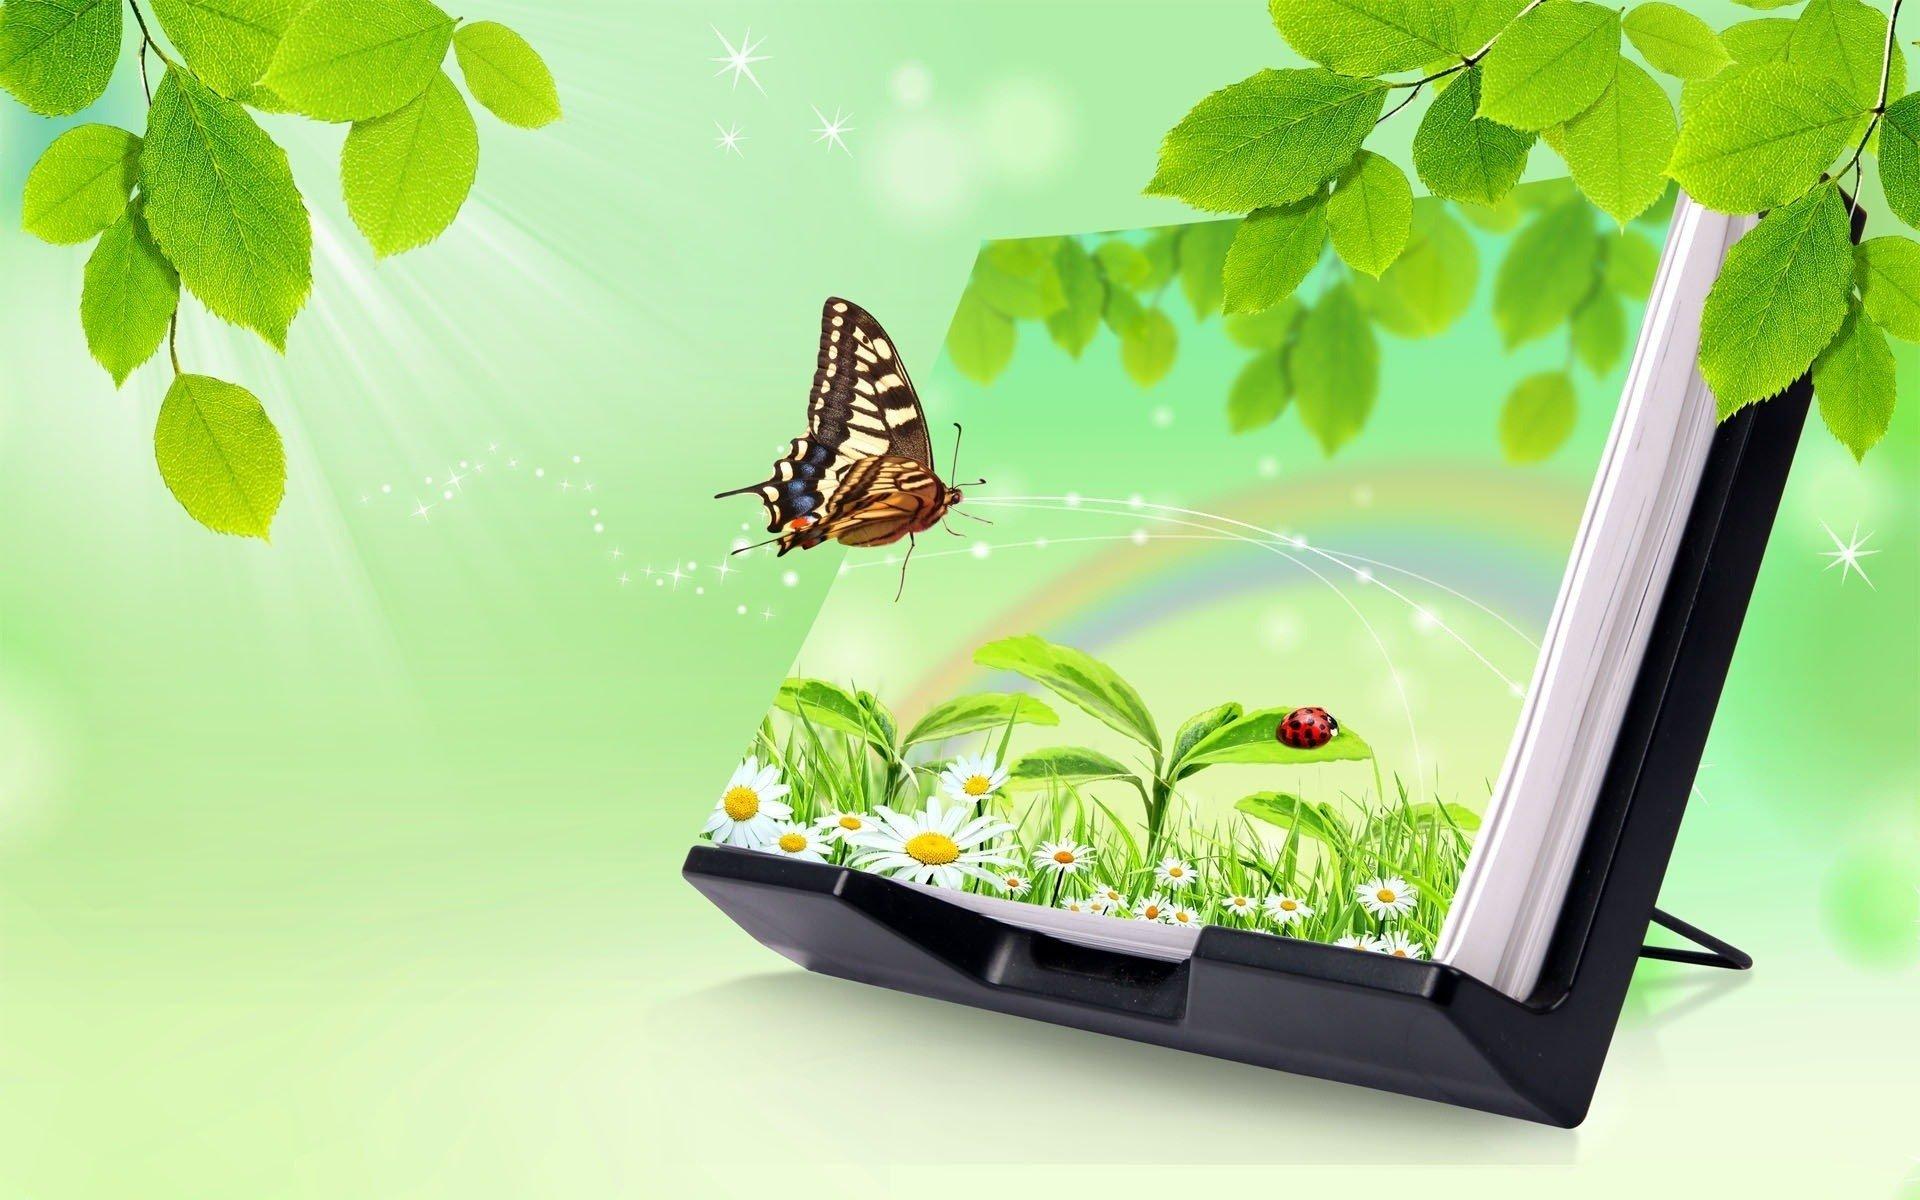 Get Free Wallpaper HD  Microsoft Store enIN